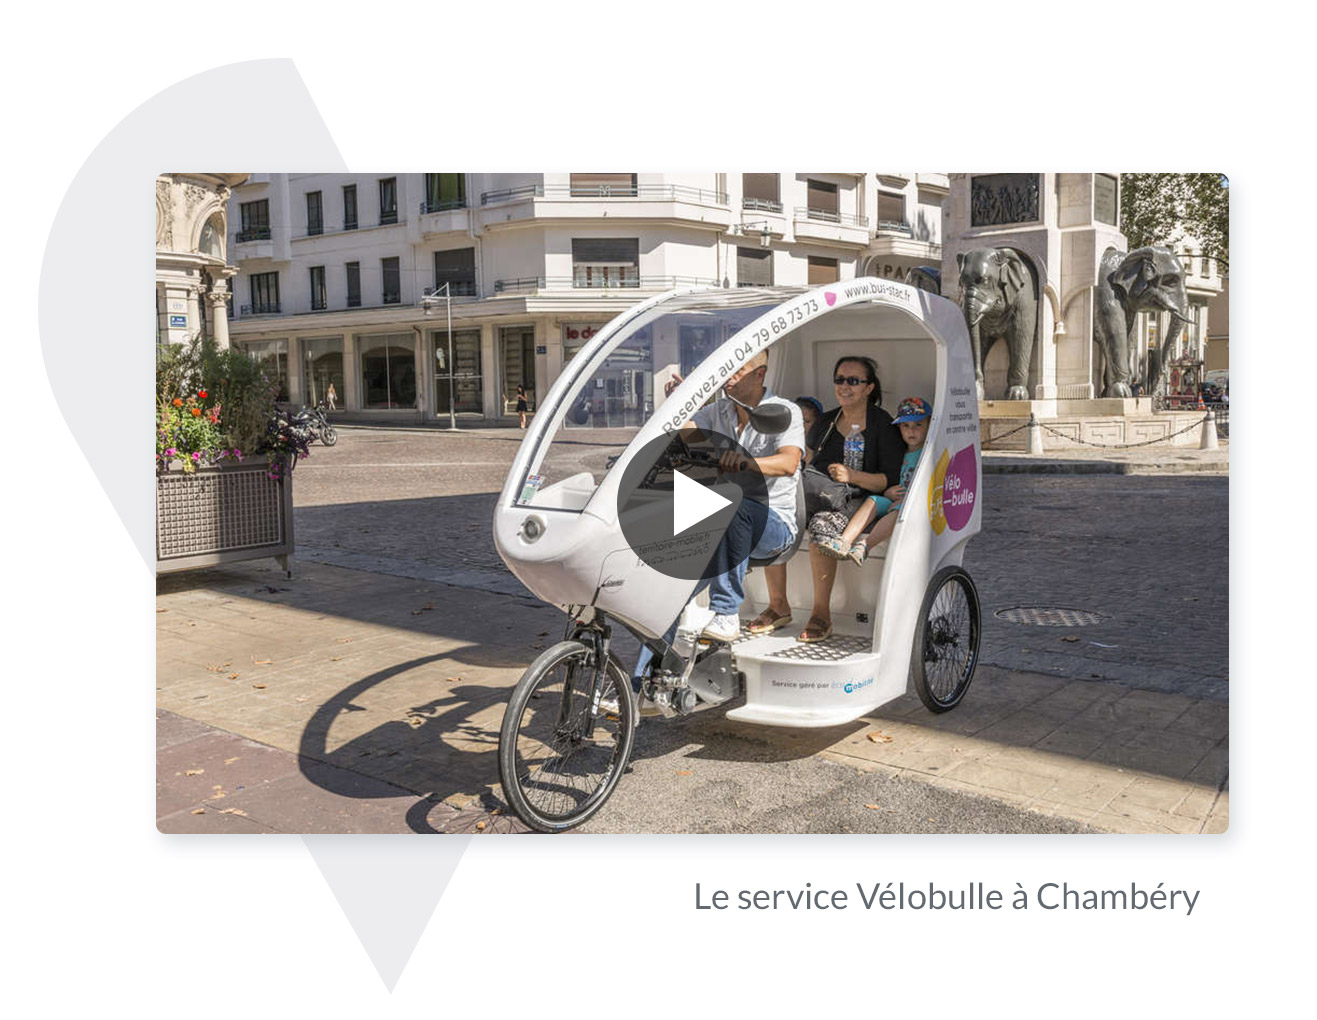 triporteur vélobulle Chambéry